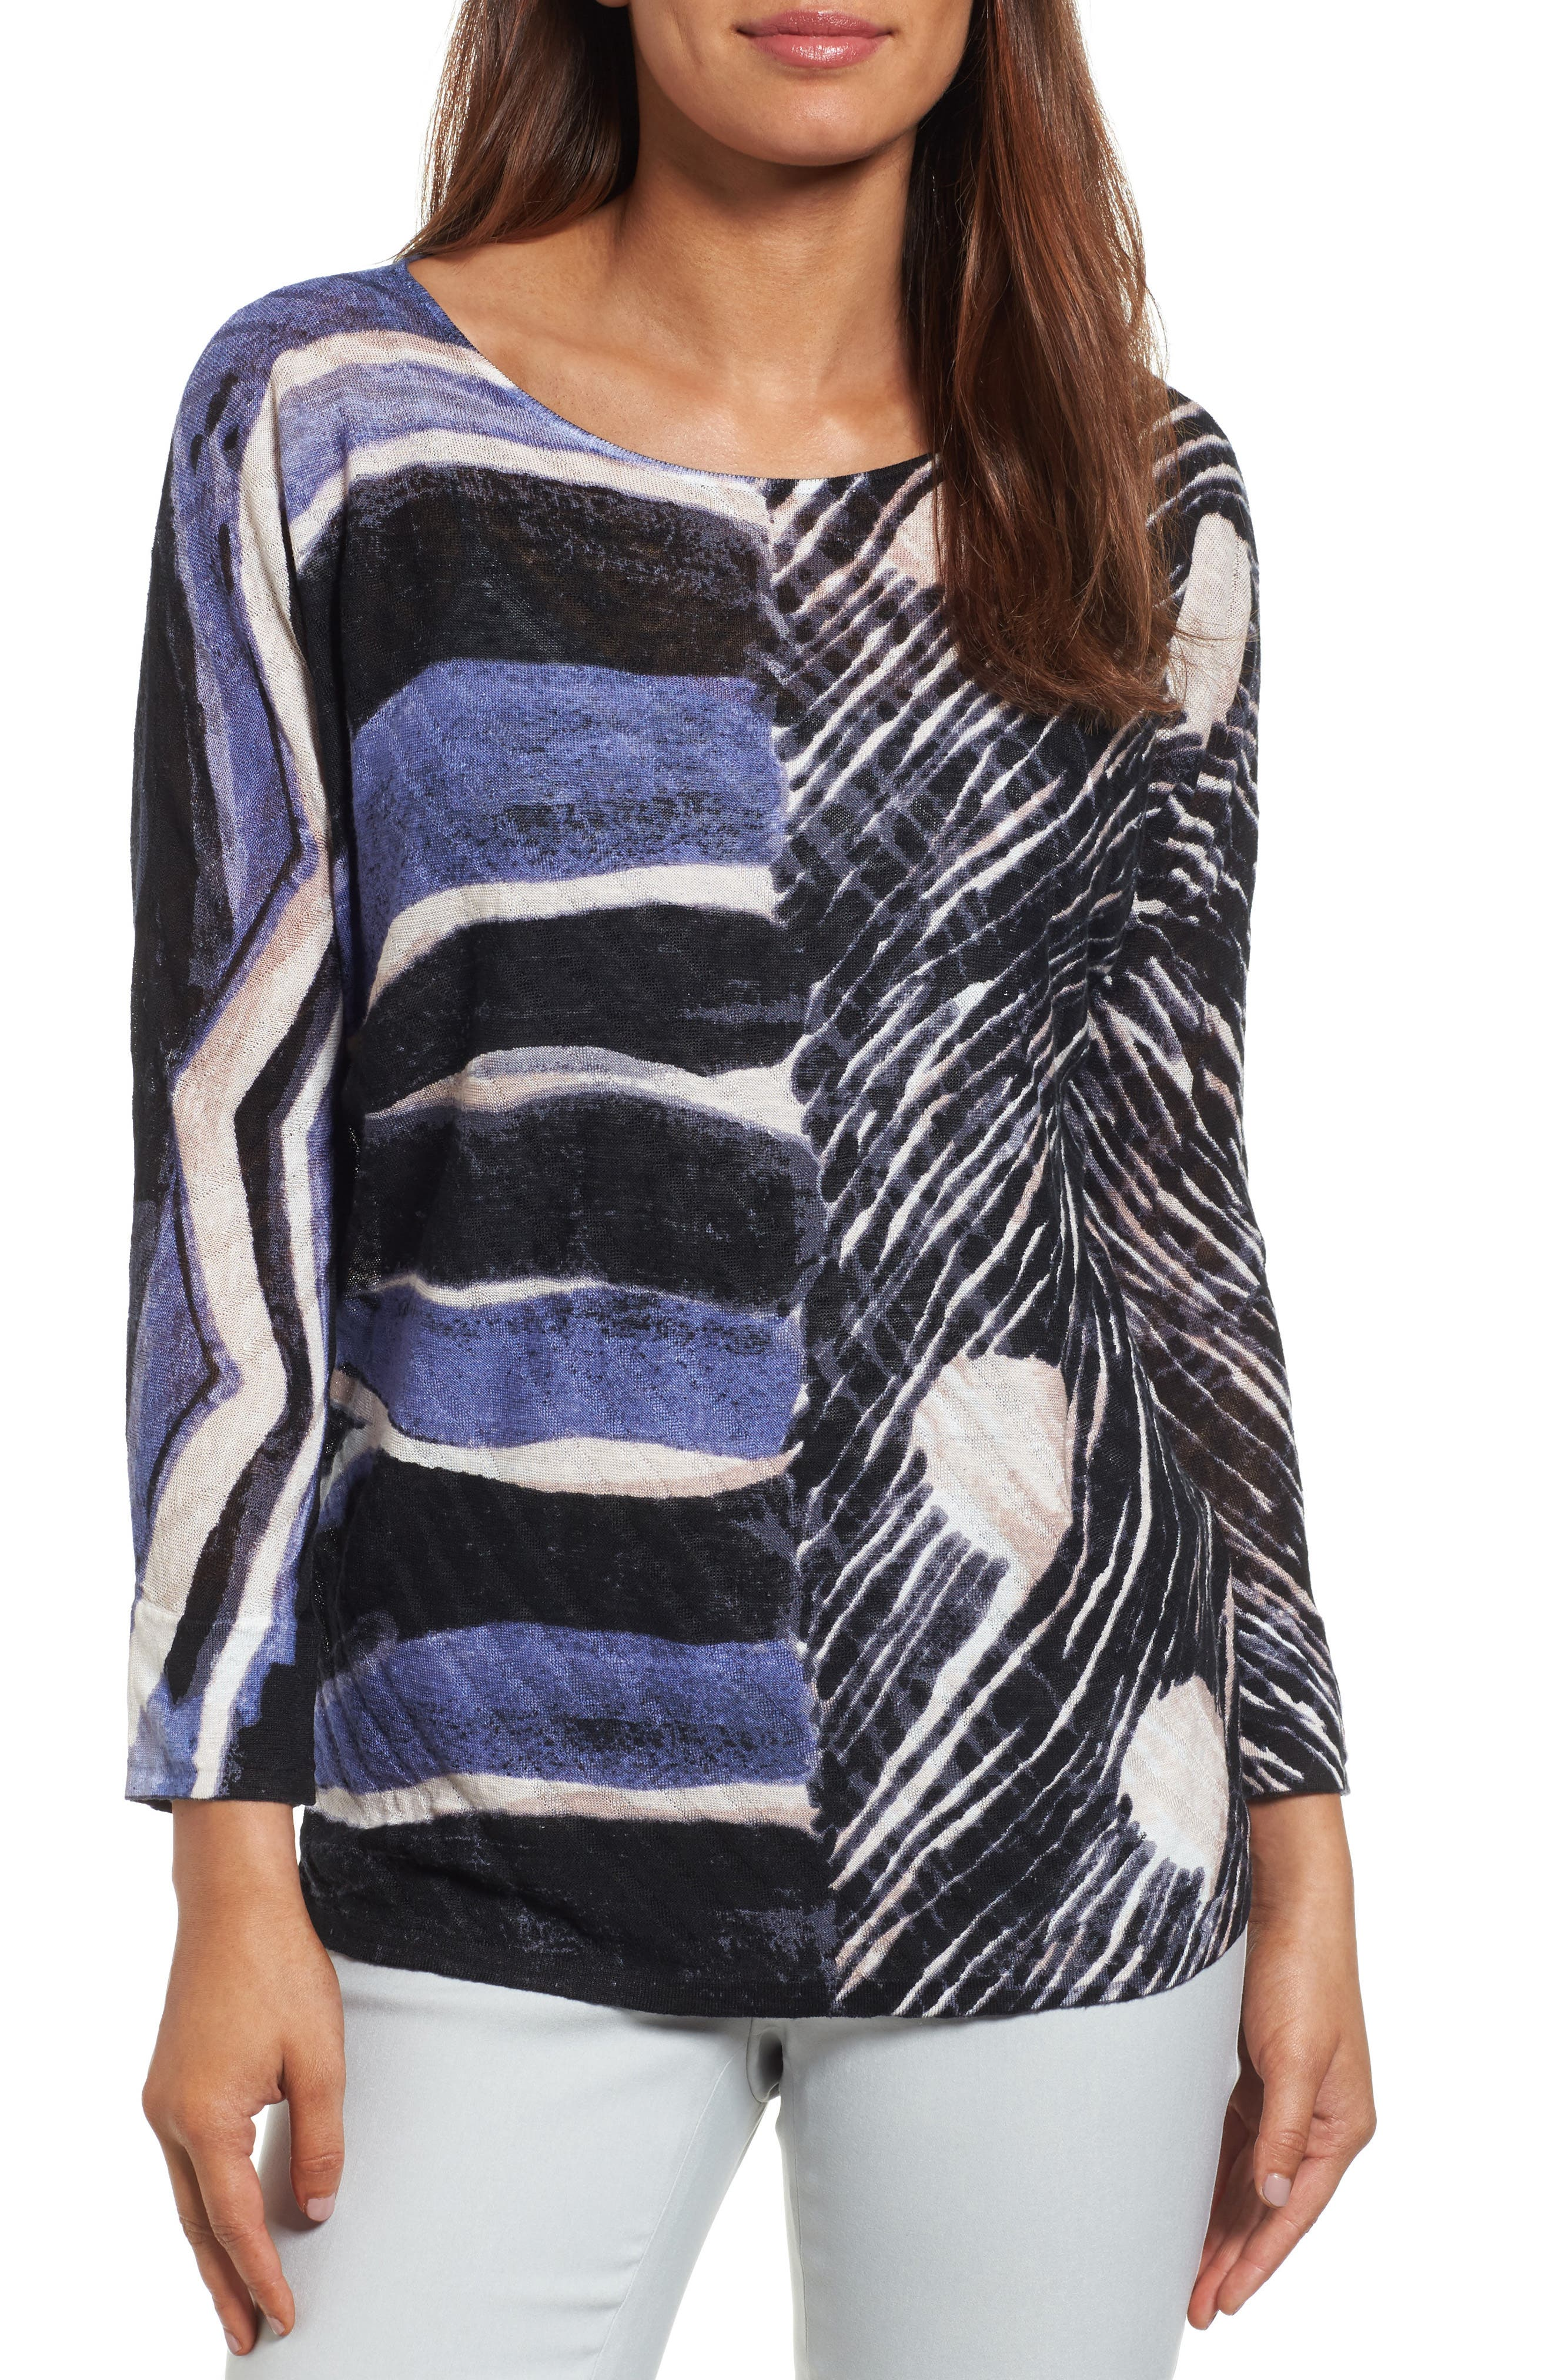 Alternate Image 1 Selected - NIC+ZOE Sierra Sweater (Regular & Petite)